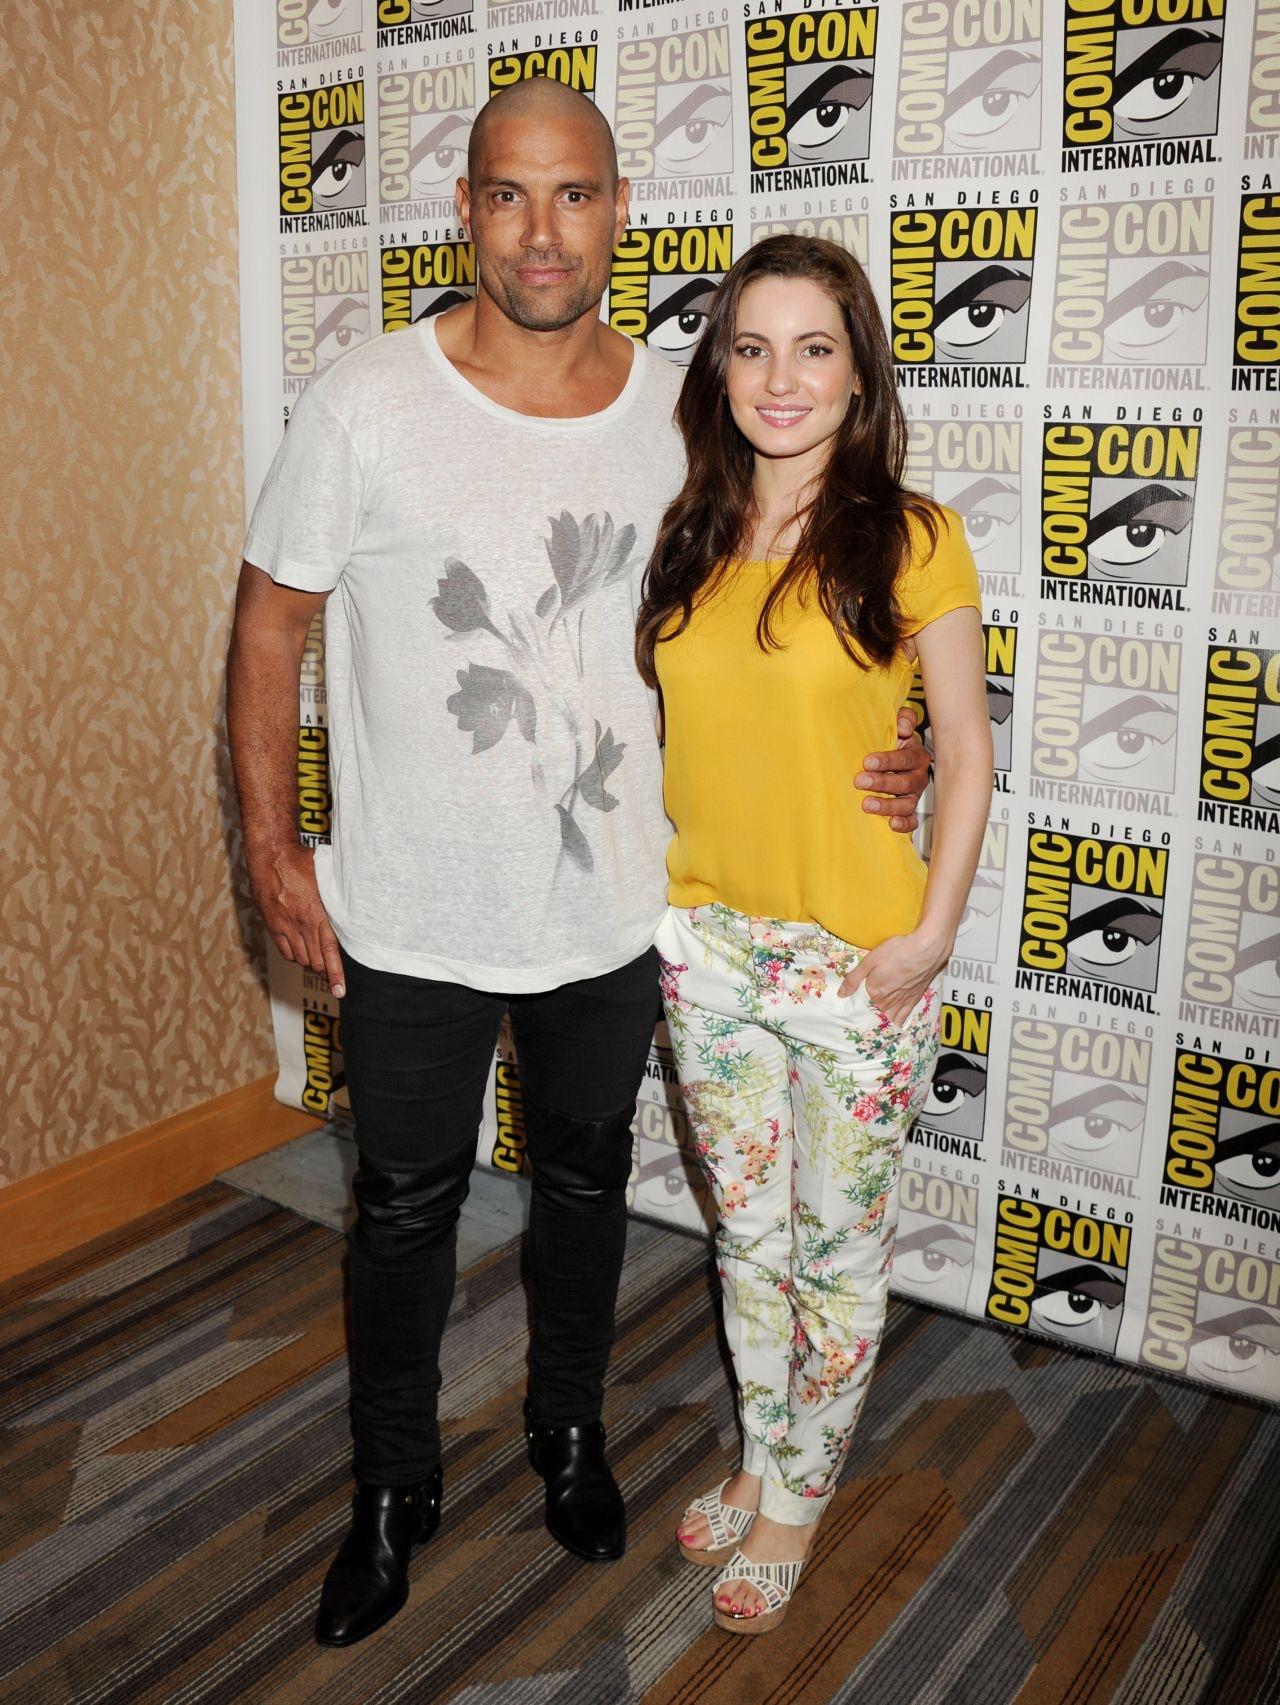 Comic-Con 2015. The Shannara Chronicles. With Manu Bennett